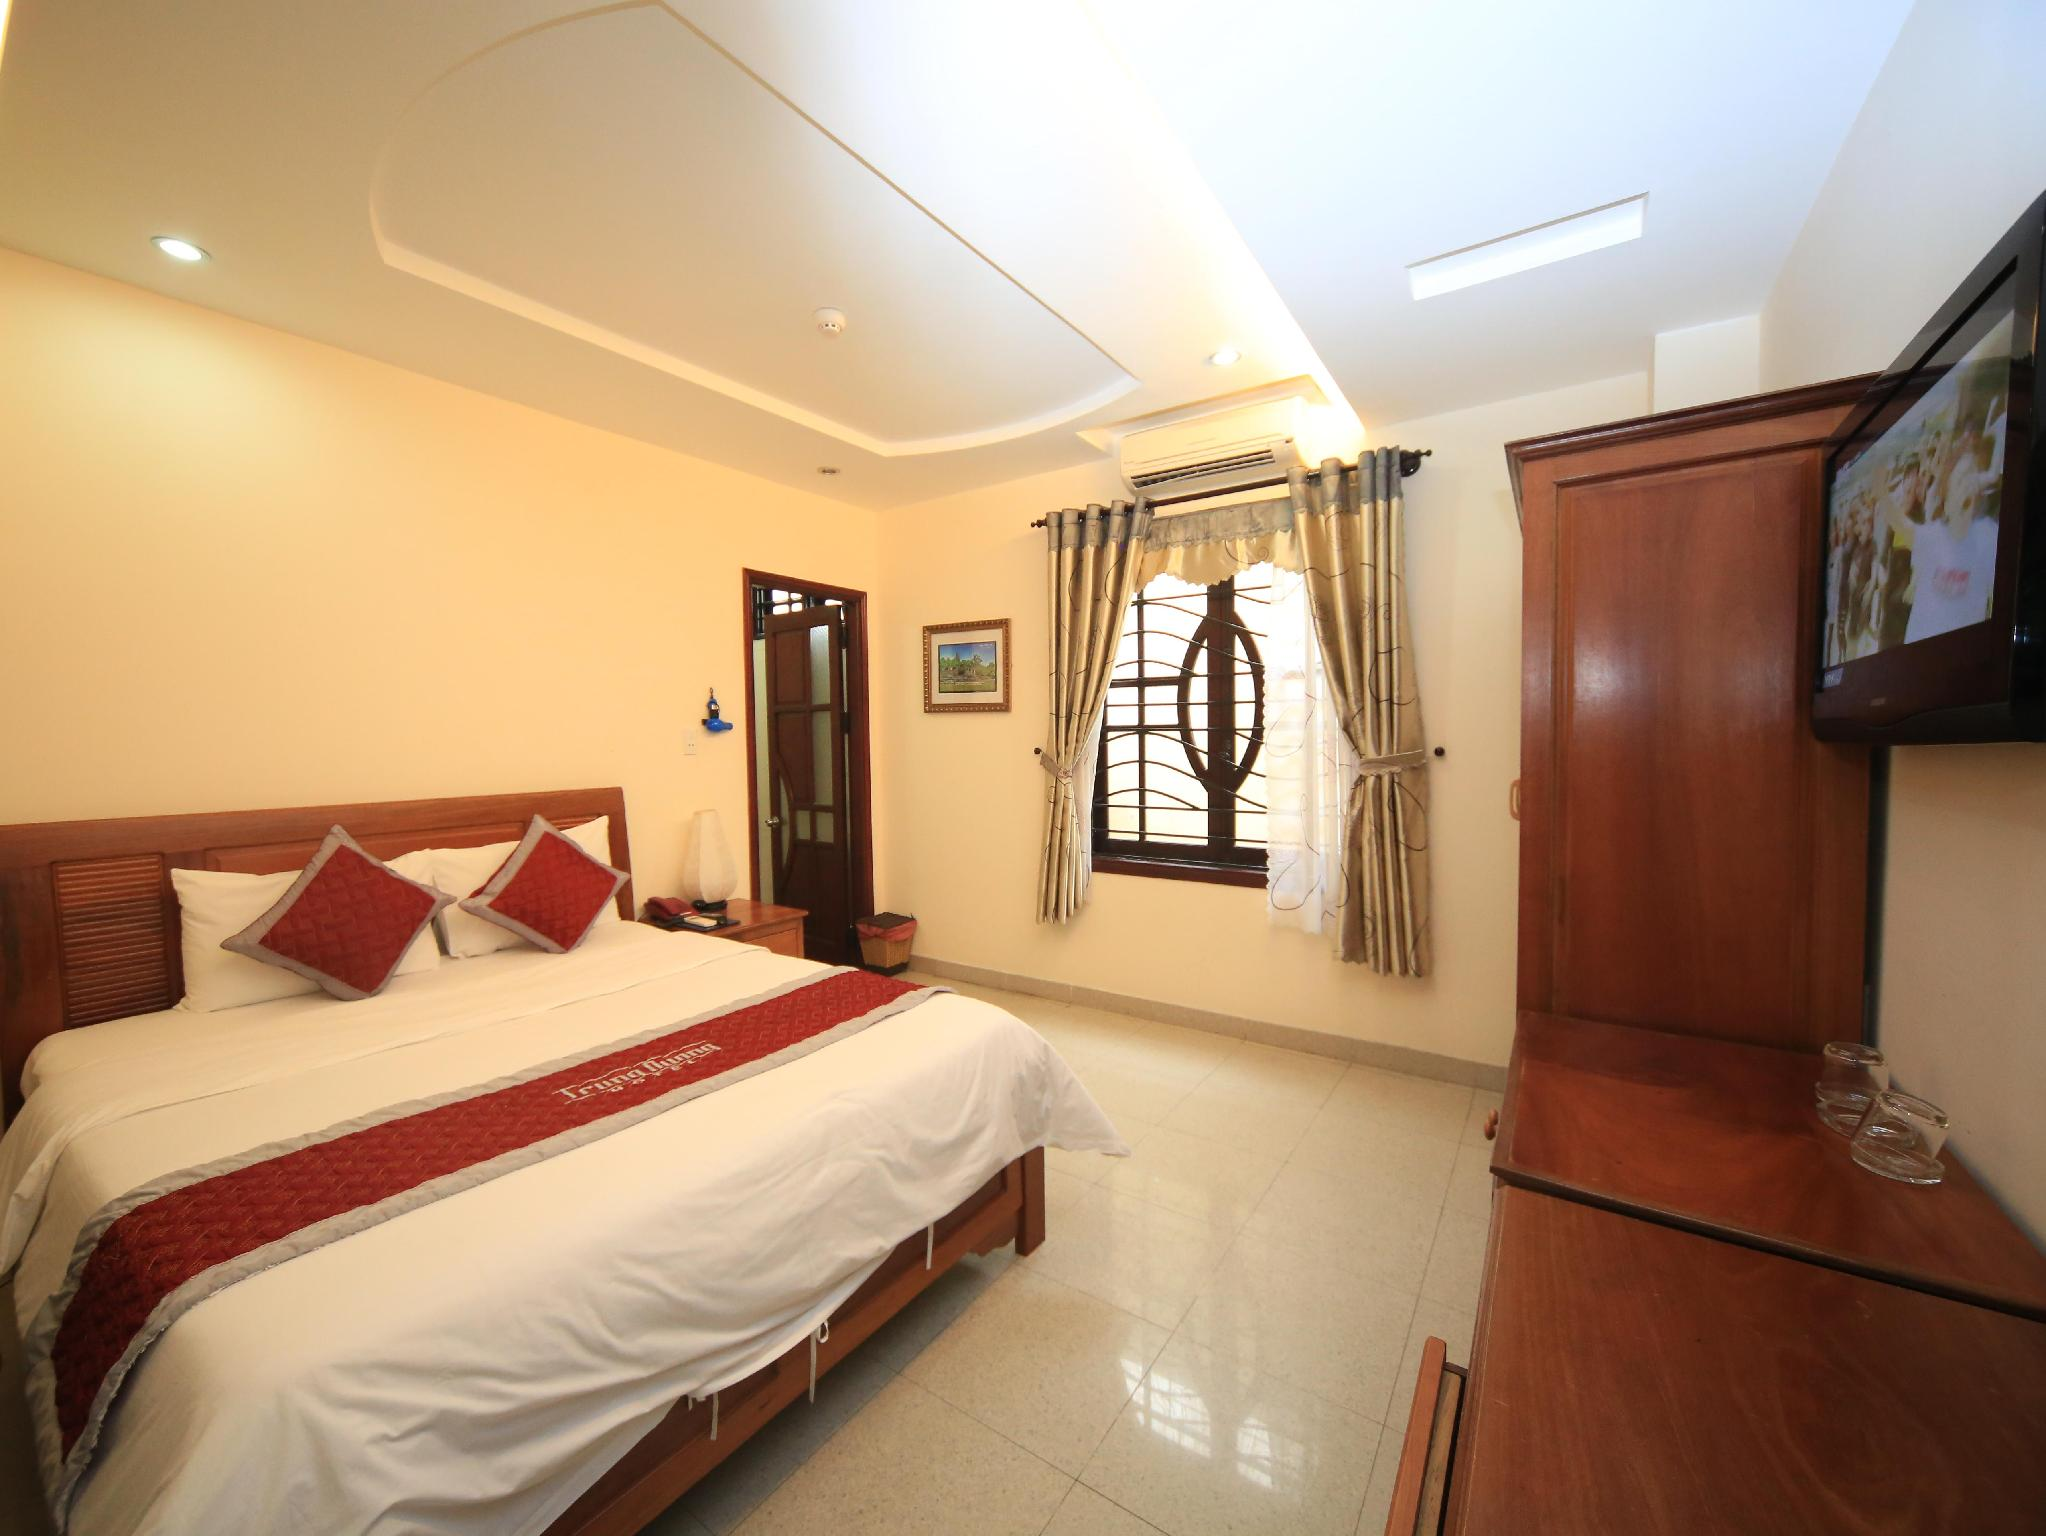 Trung Duong Da Nang Beach Hotel - Hotell och Boende i Vietnam , Da Nang